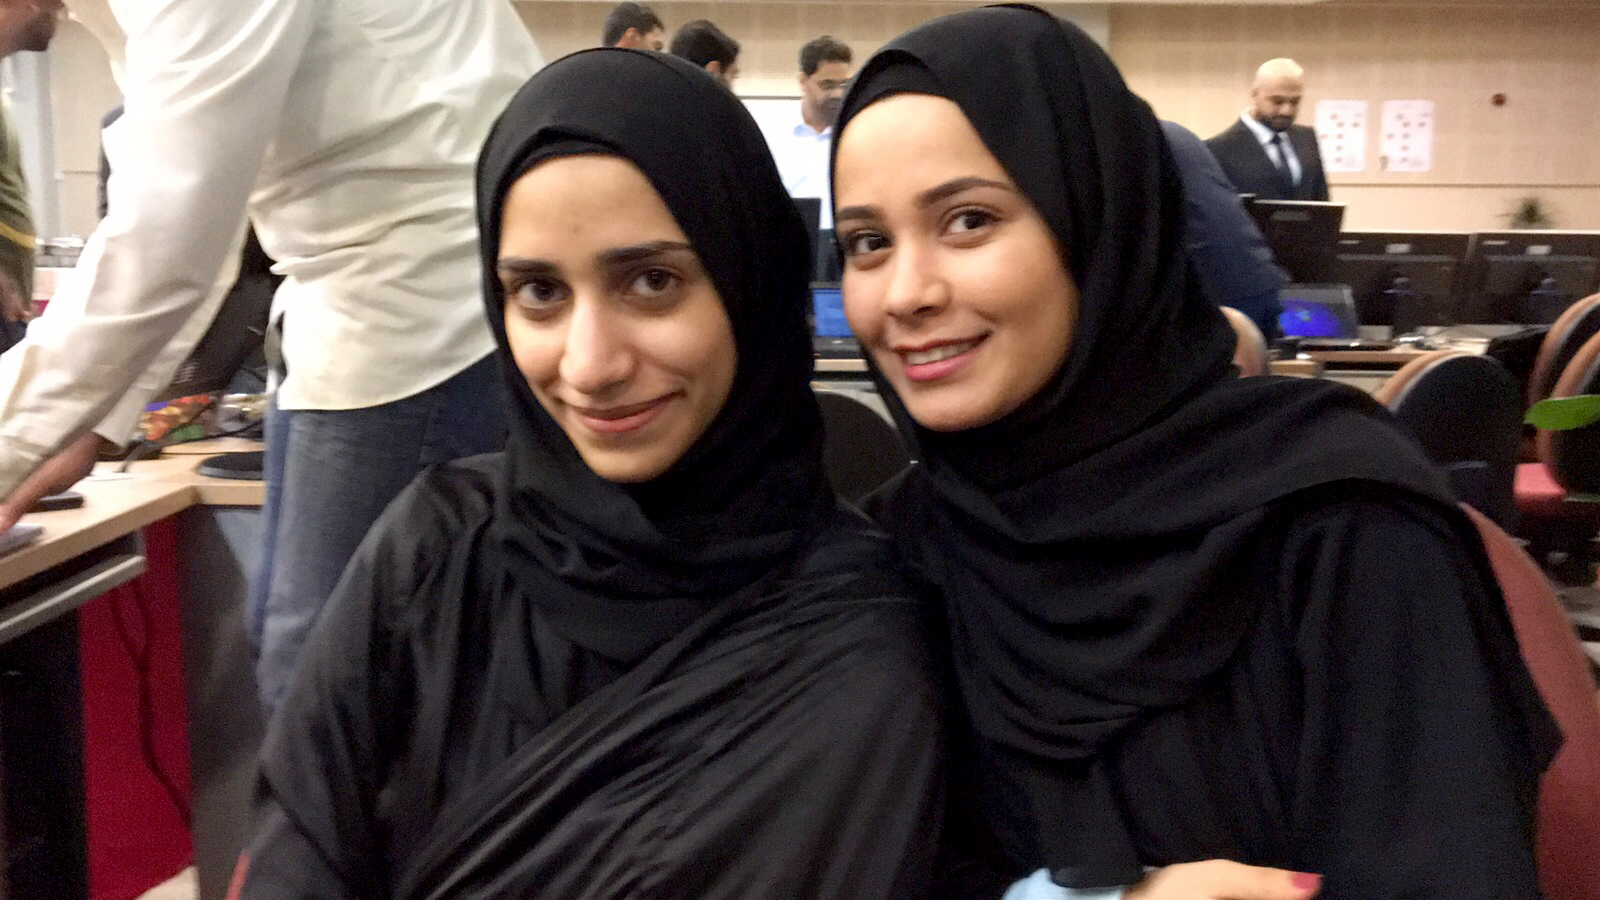 بالصور بنات البحرين , بنات البحرين اجمل بنات 1115 2